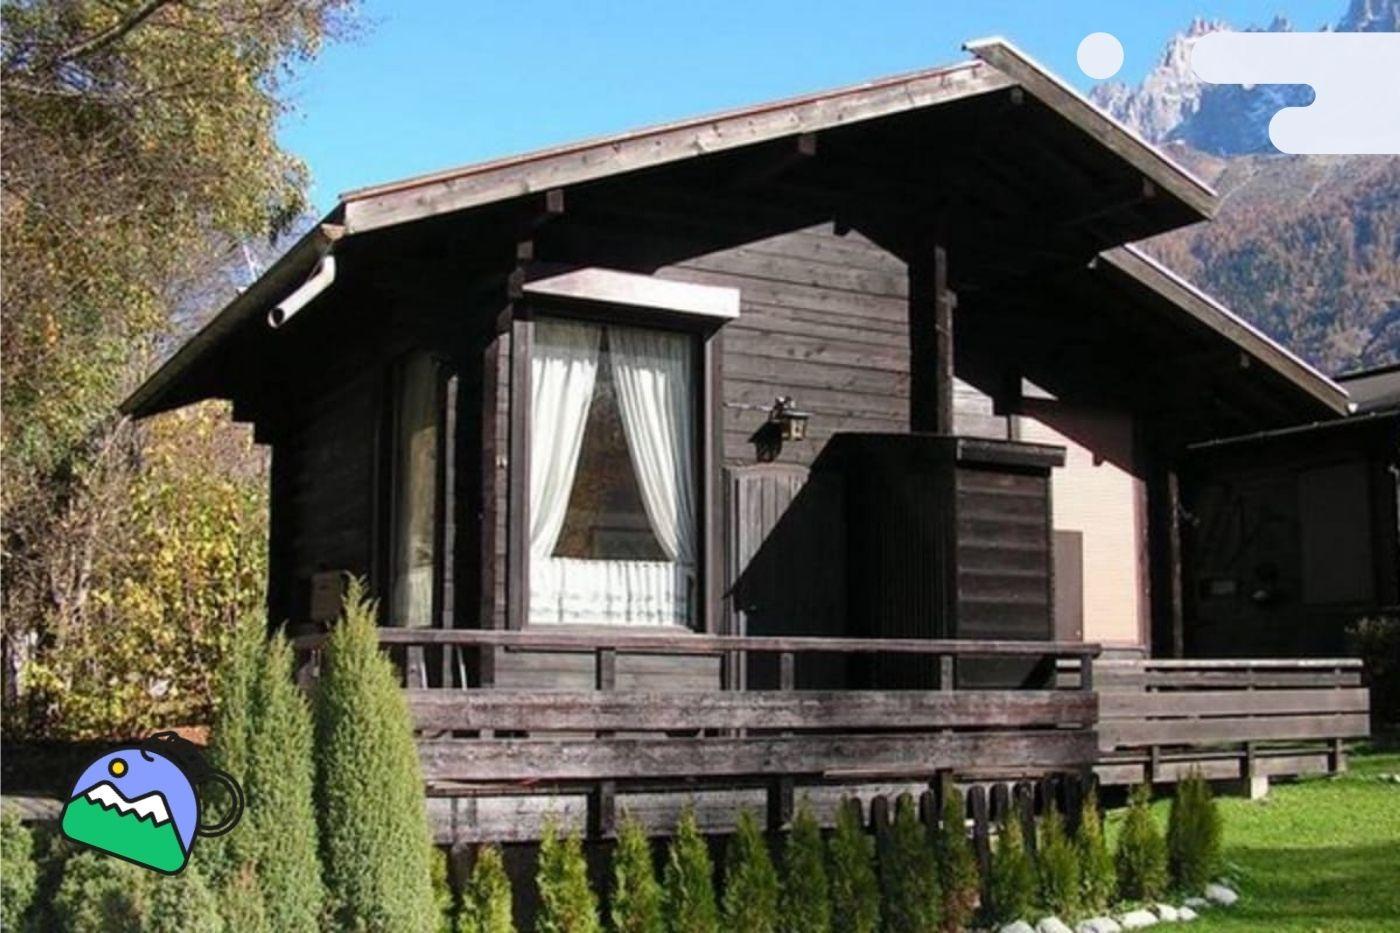 Top 10 des logements Airbnb les plus insolites de France